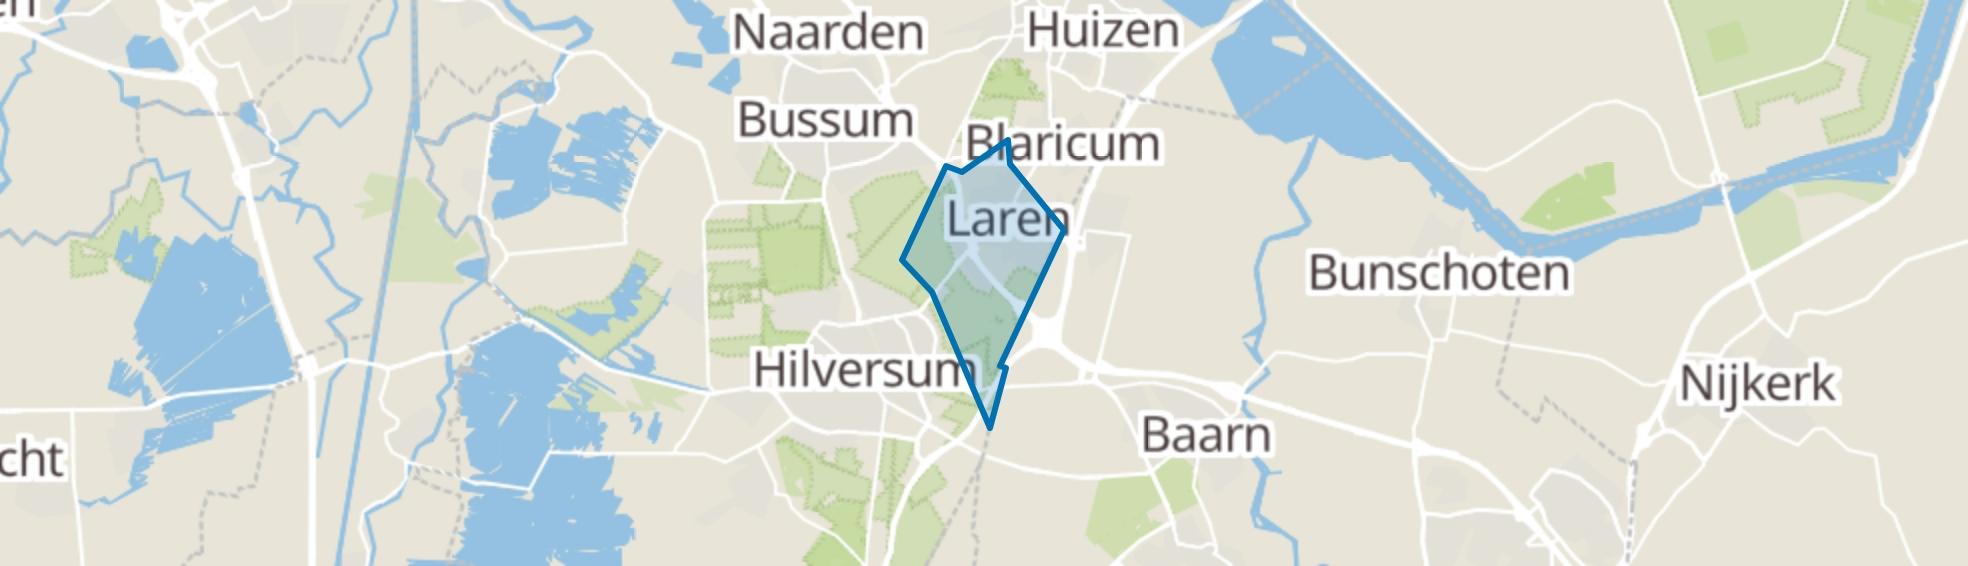 Laren (NH) map